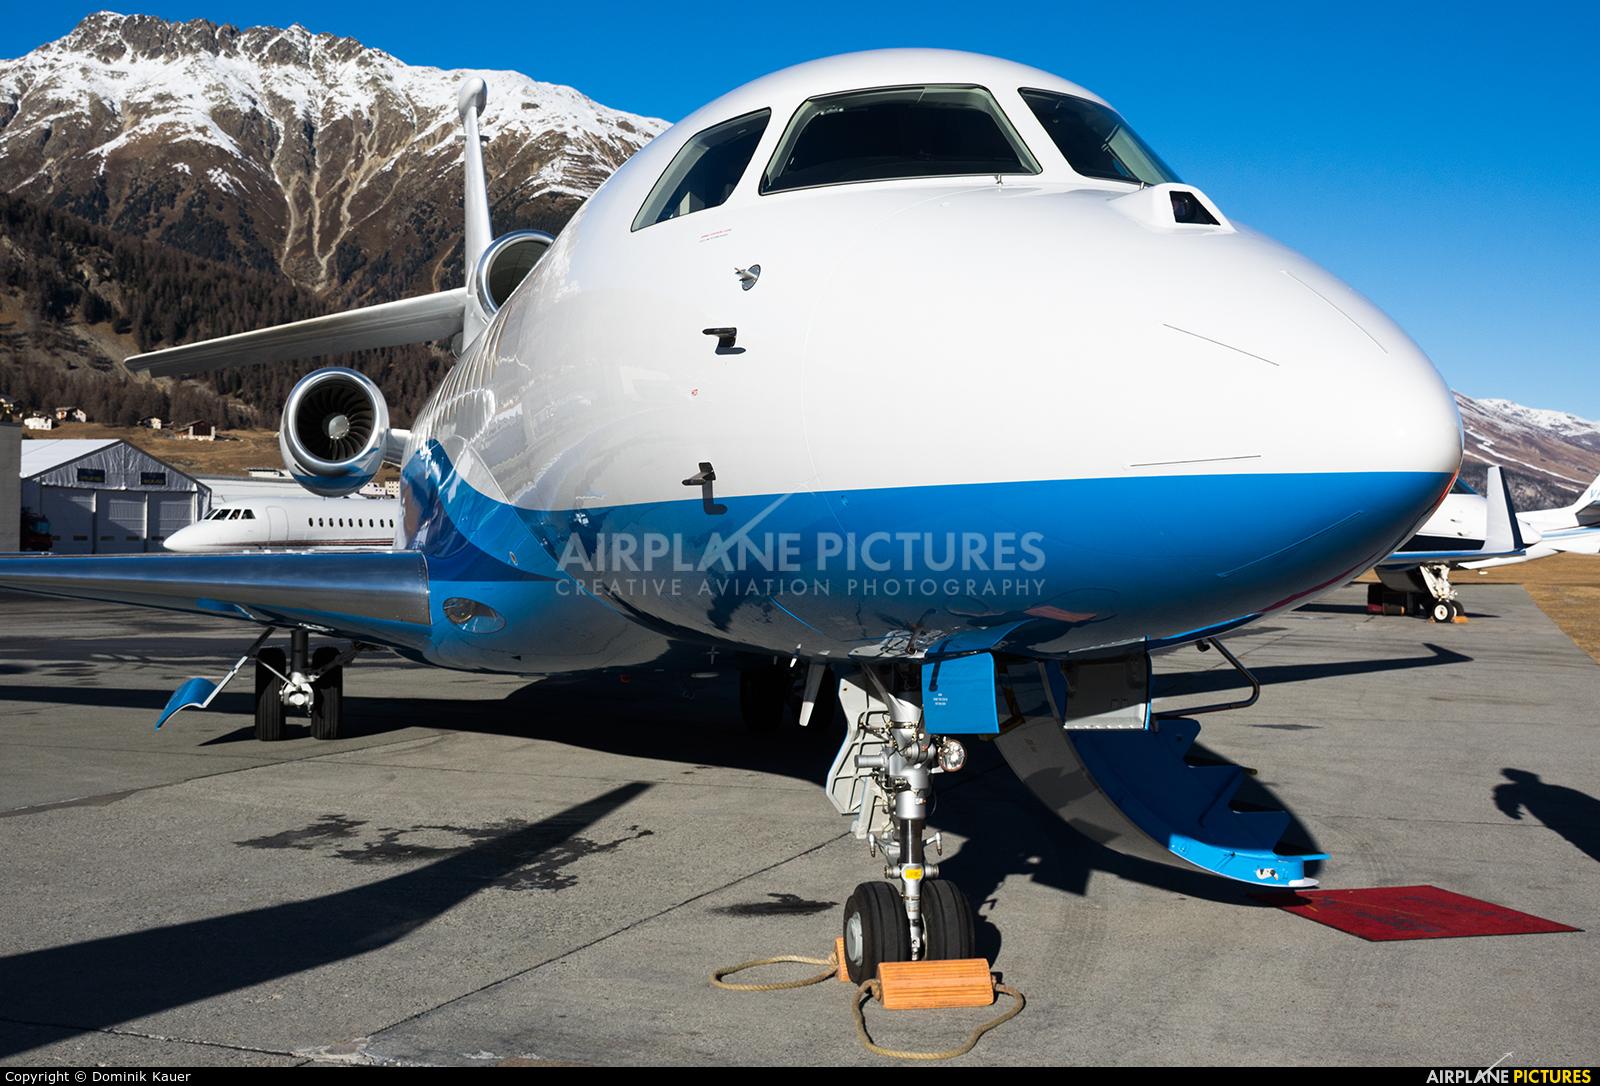 Abelag Aviation OO-GPP aircraft at Samedan - Engadin